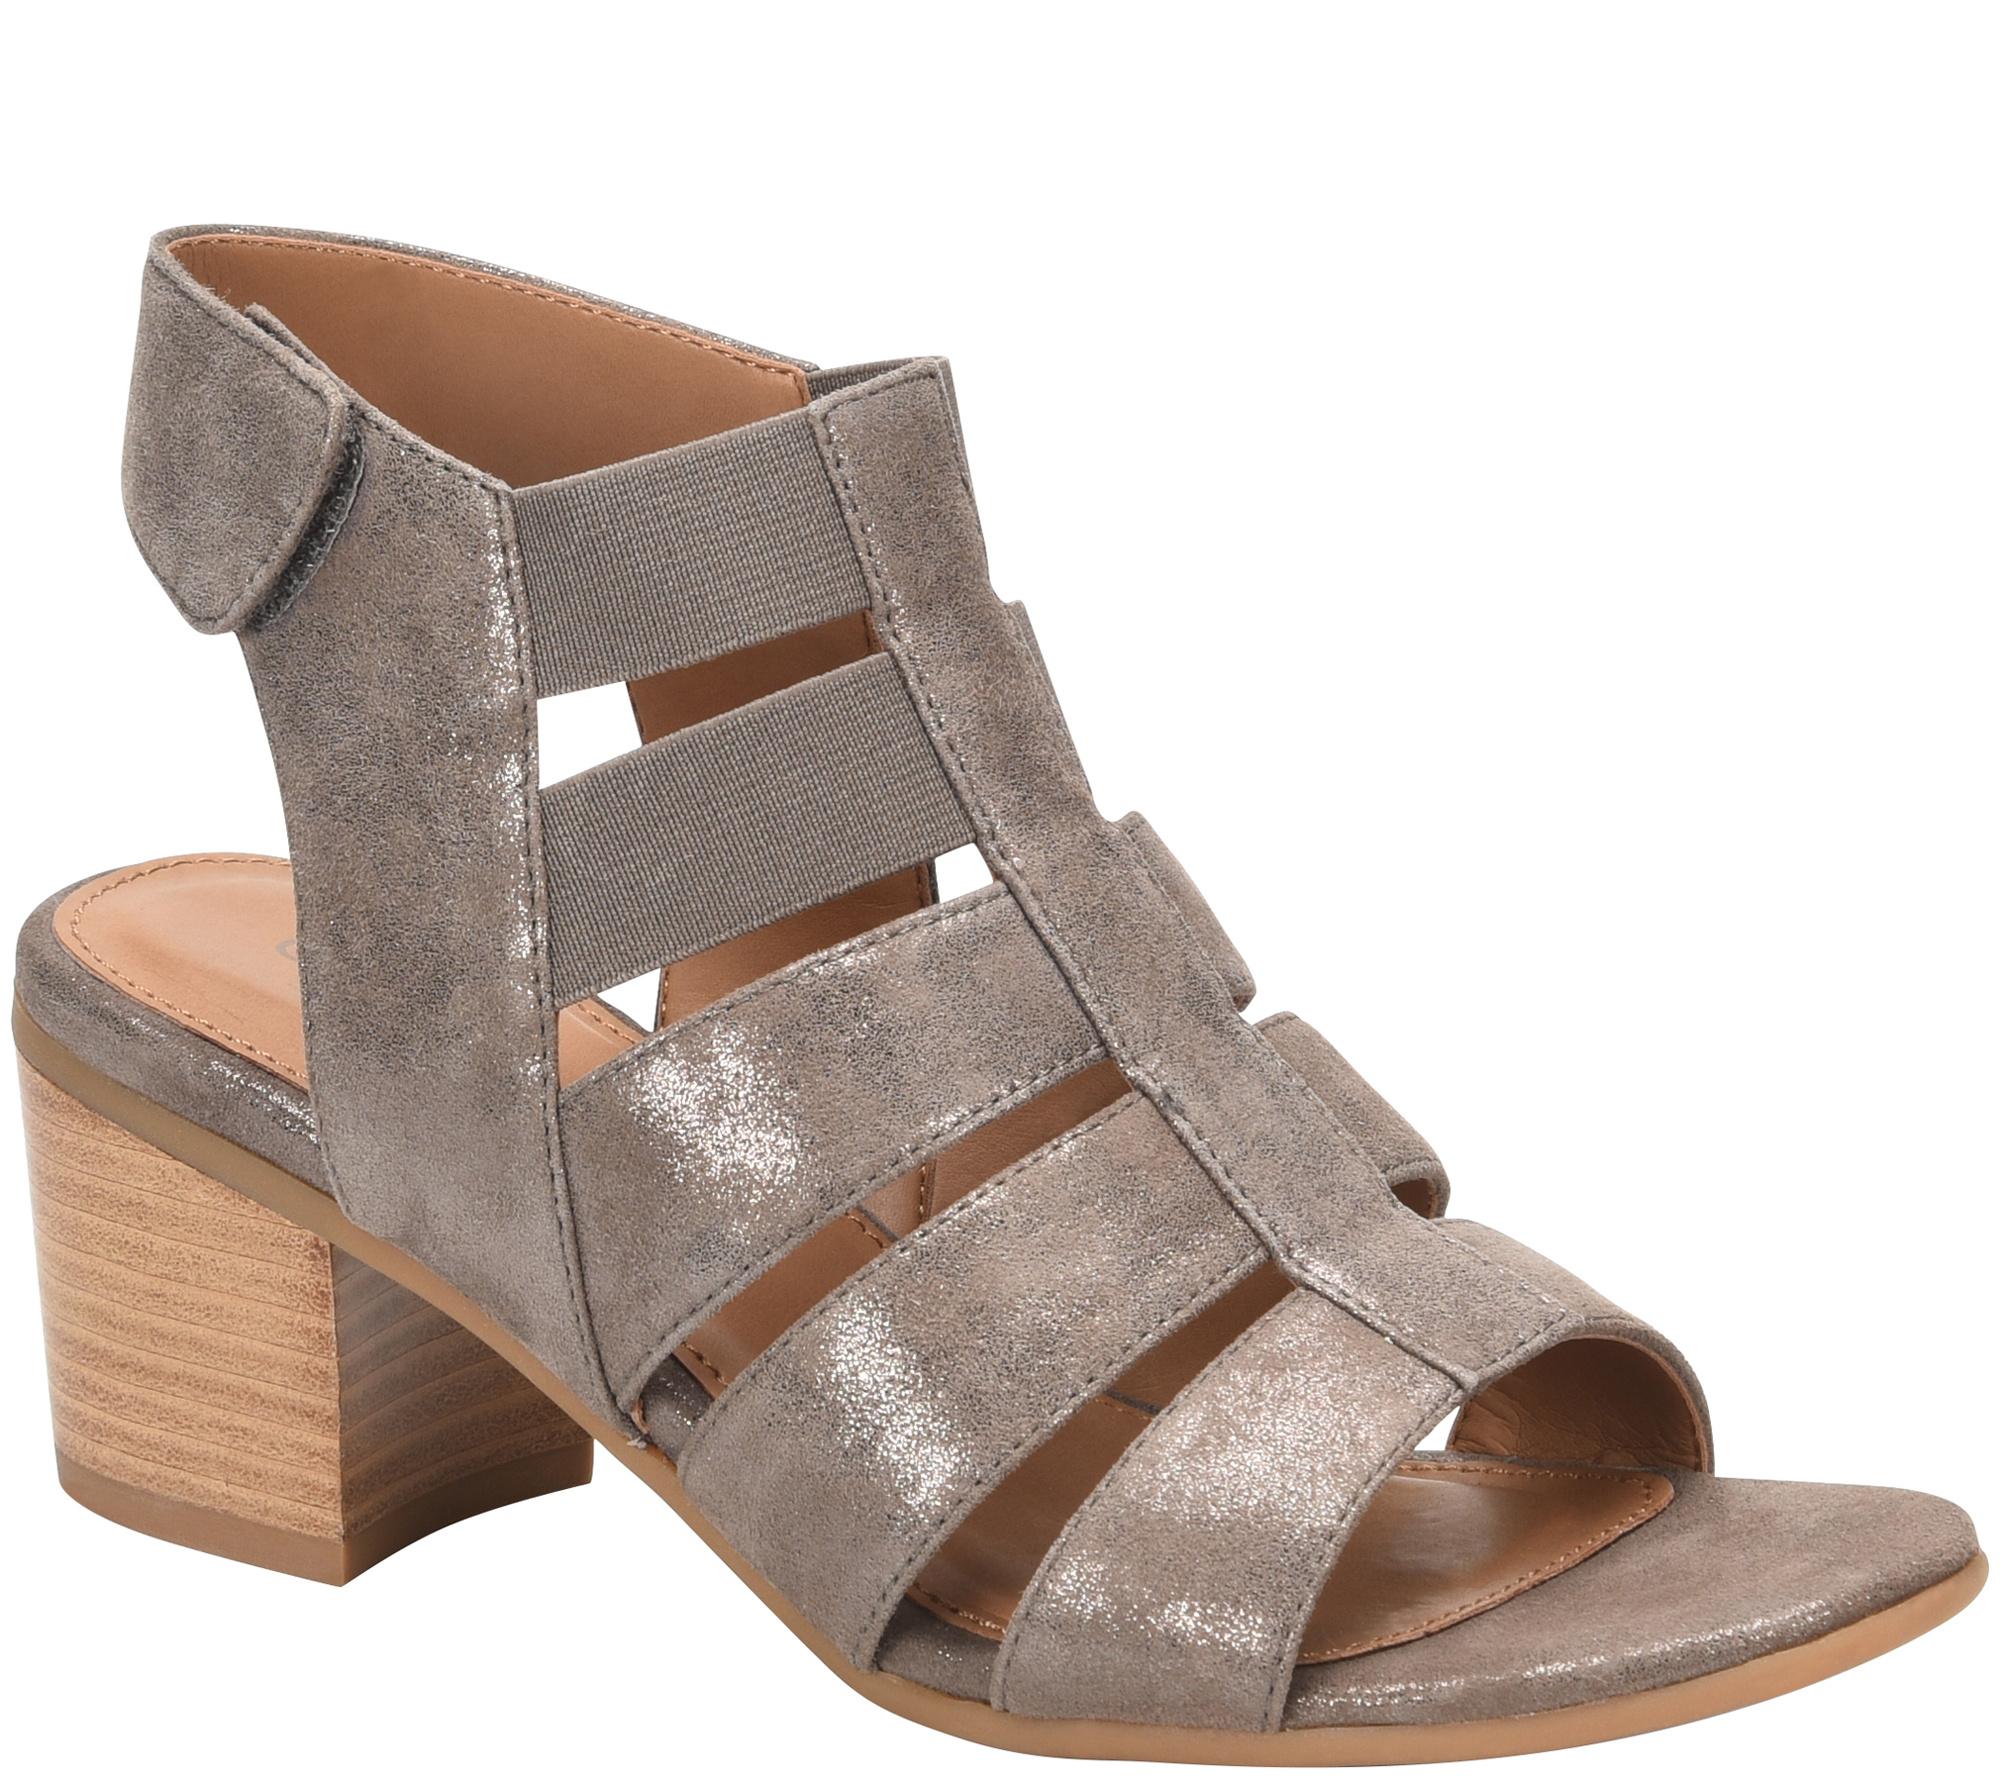 Comfortiva Alexis Leather Gladiator Block Heel Sandals